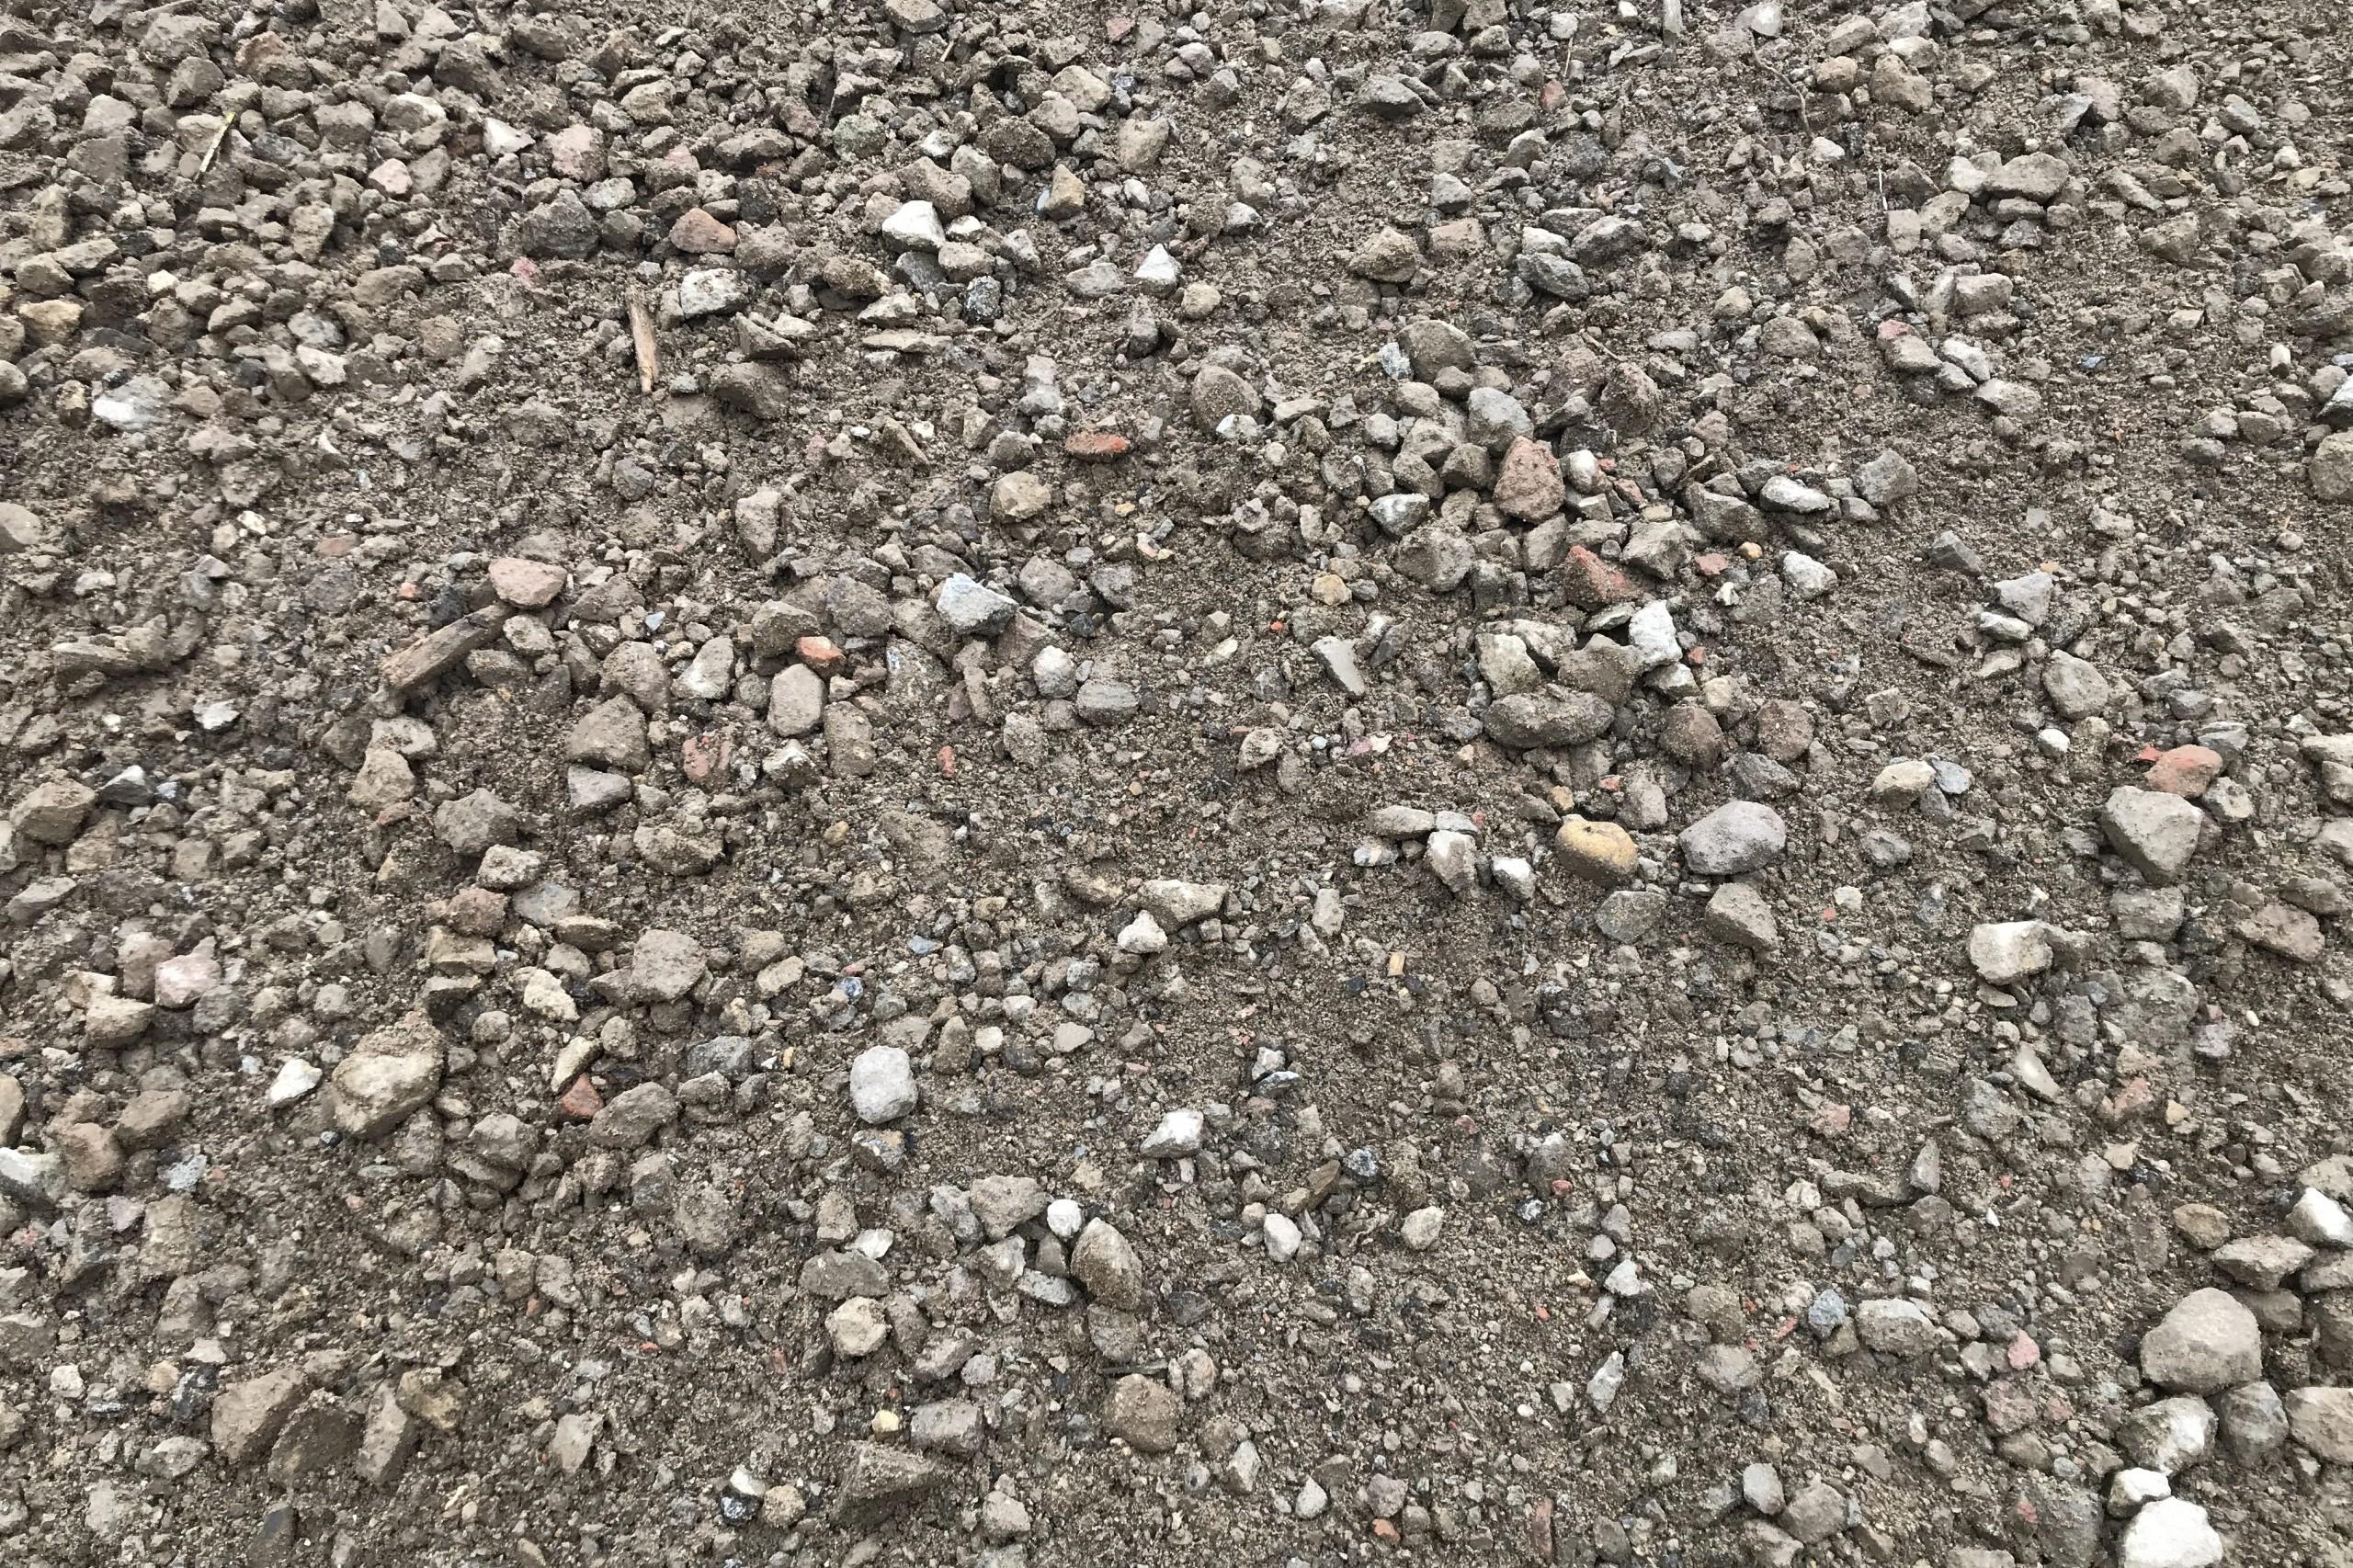 Baustoffe - Sand, Kies, Beton, Recycling